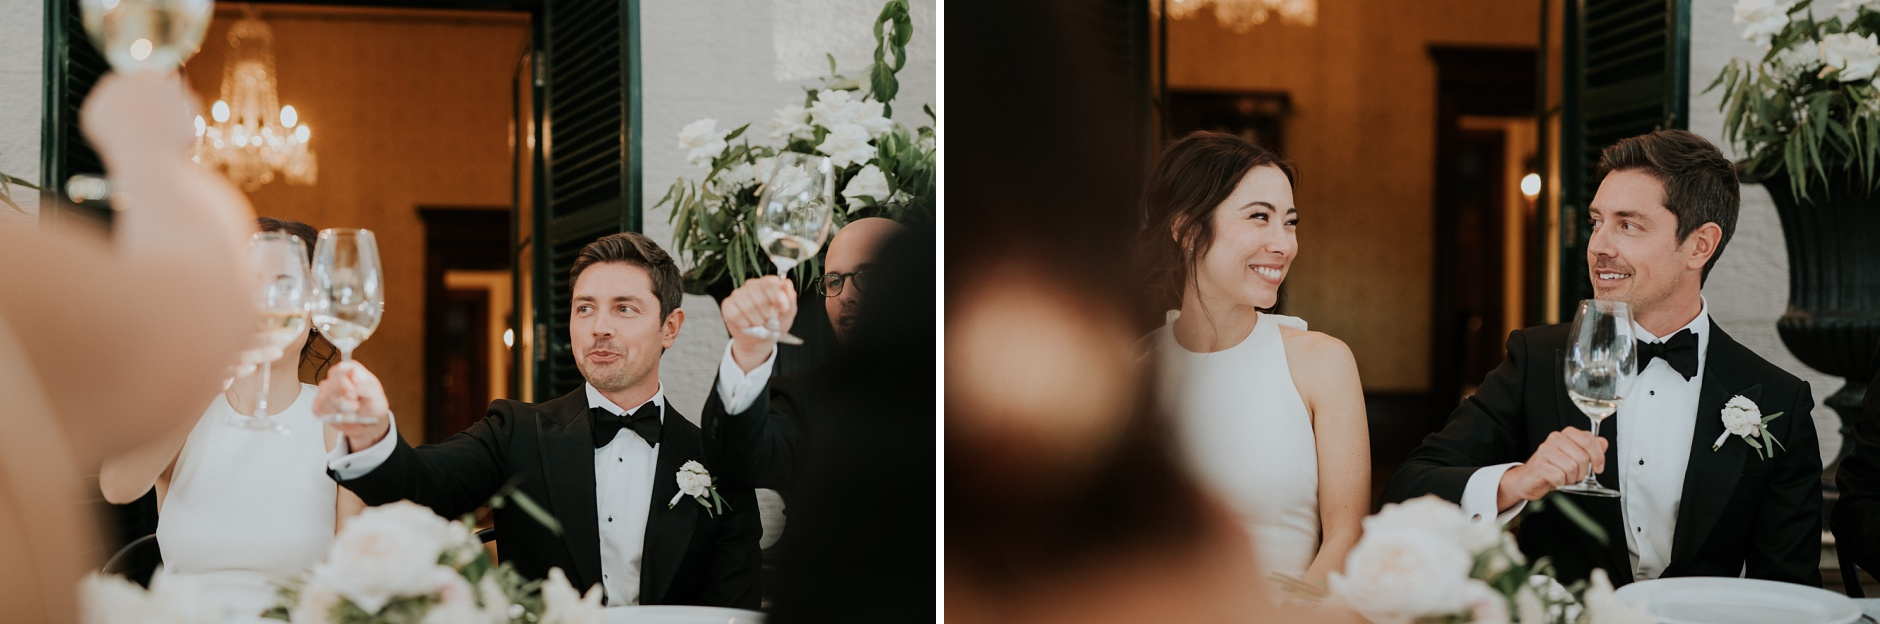 Sydney-Wedding-Photographer_0048.jpg